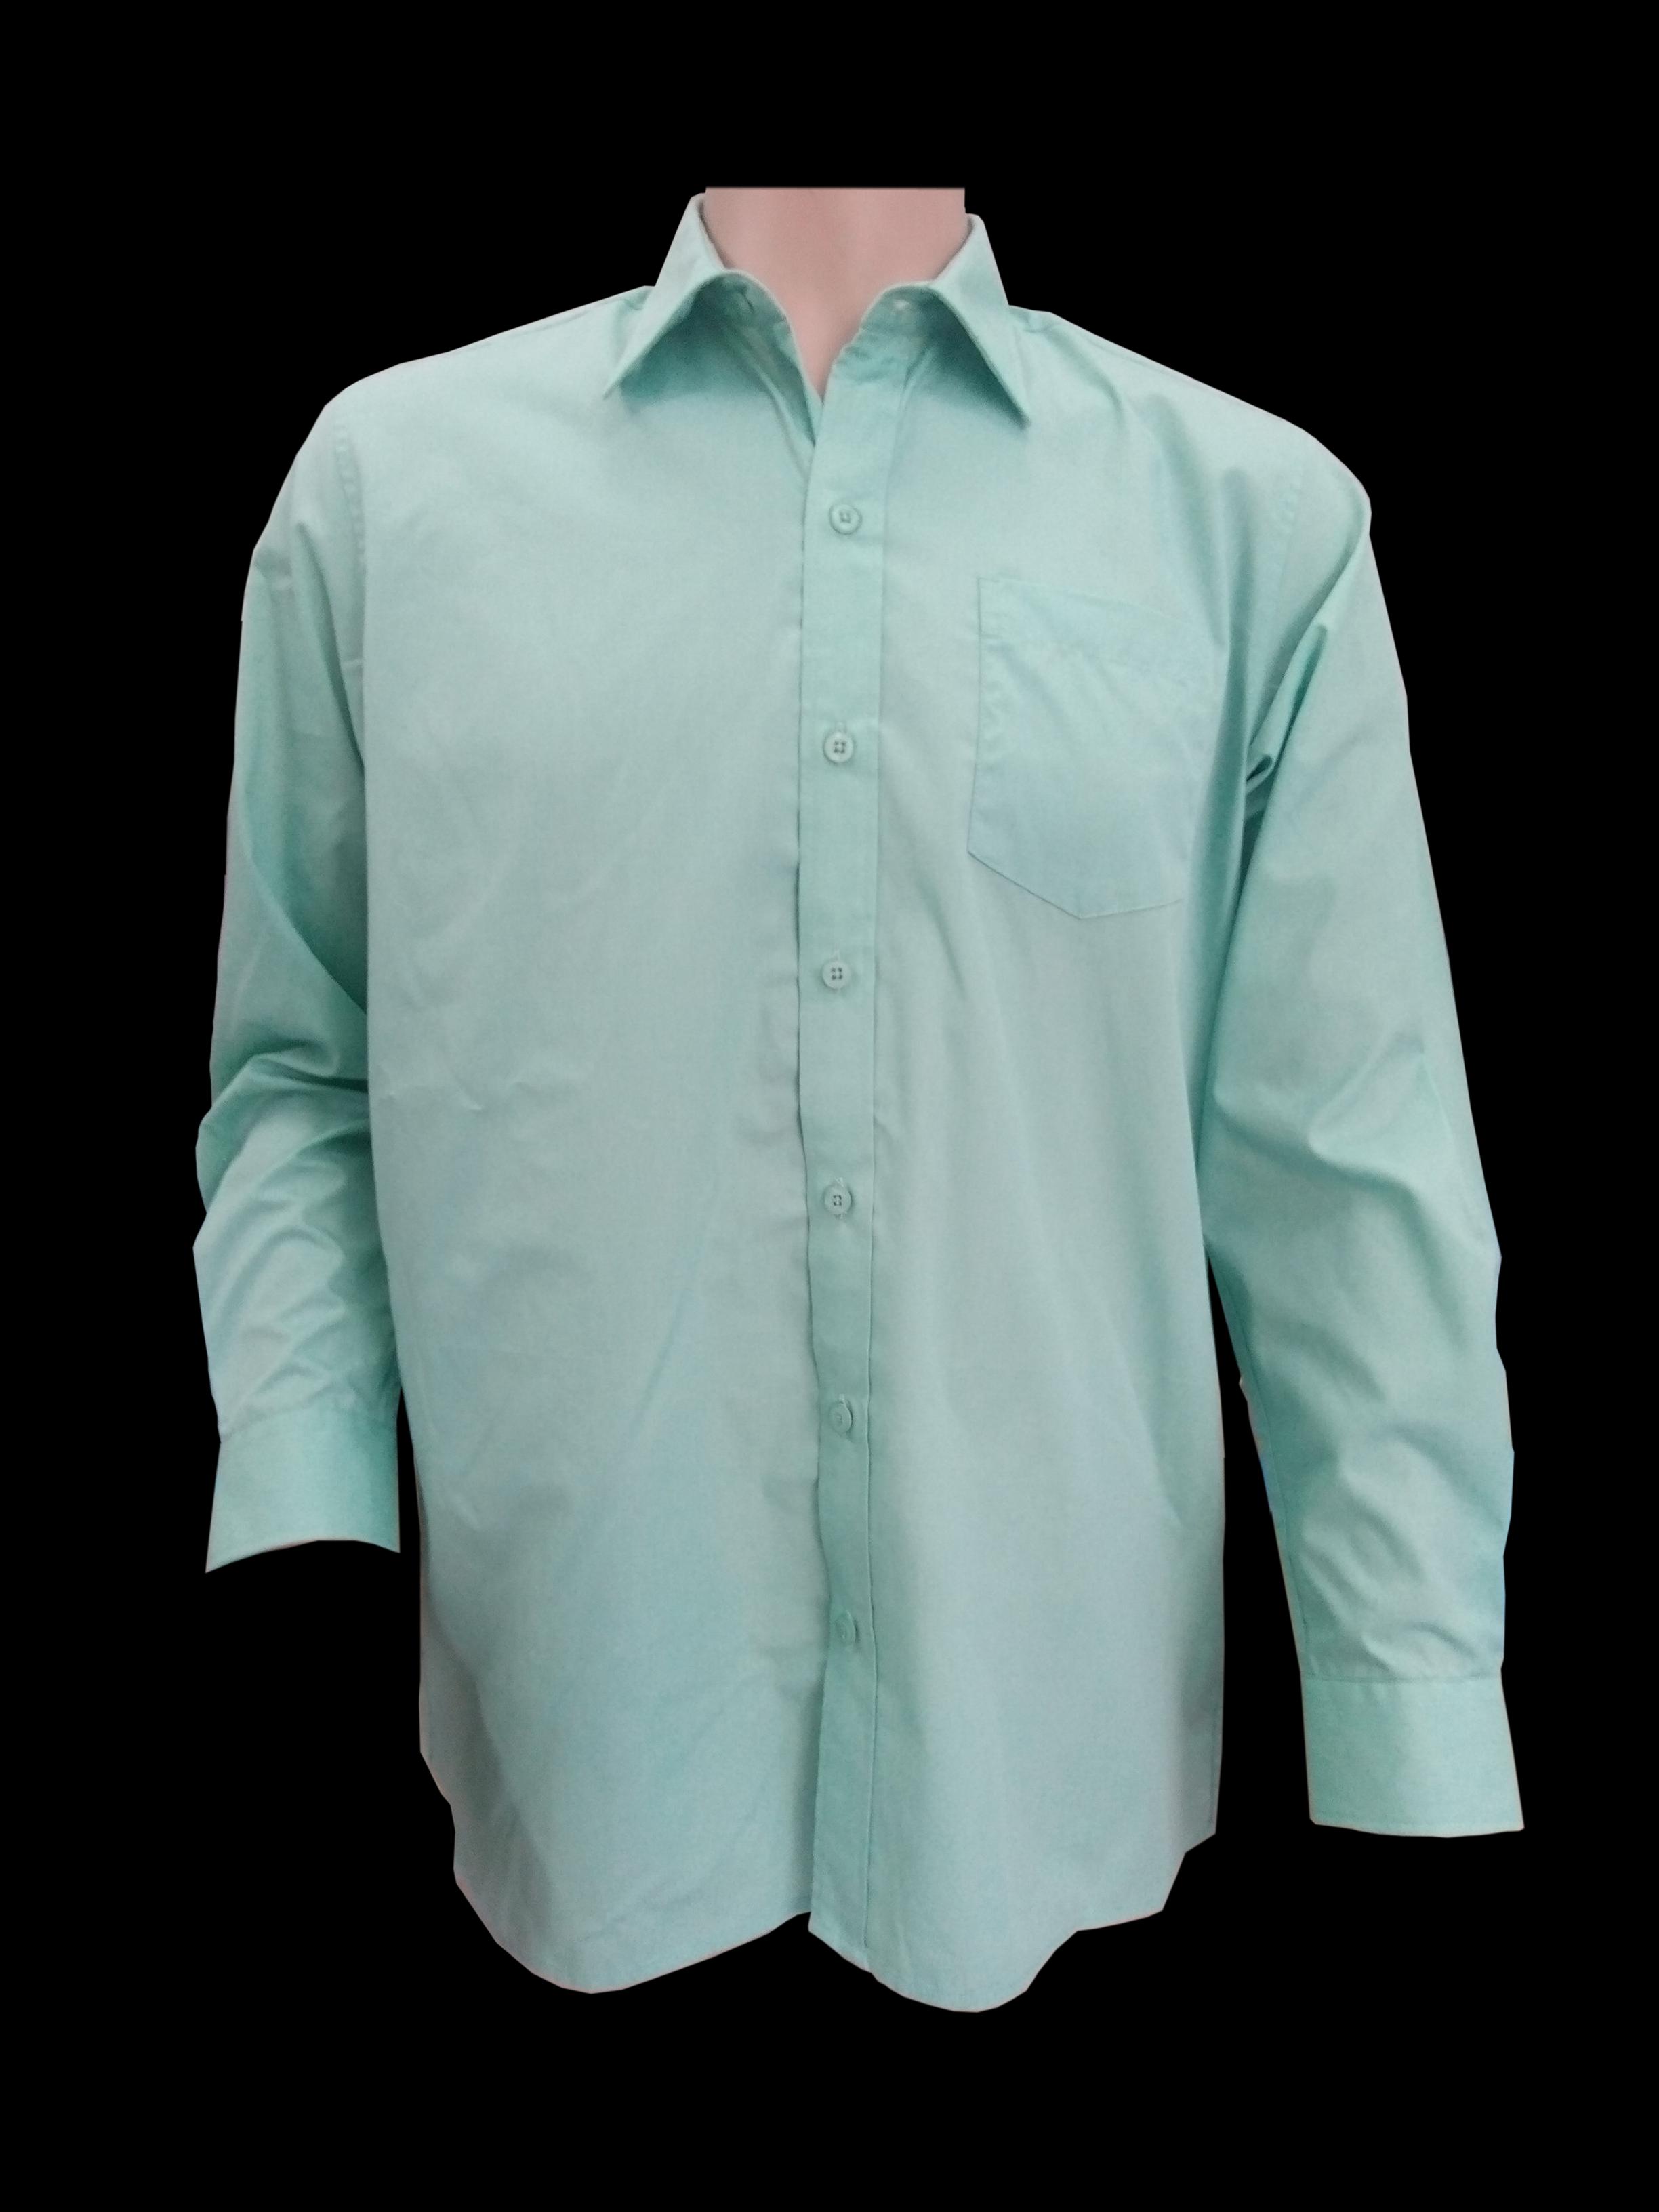 Boy Shirt Ls Mint Color Bs015 Premium School Uniforms